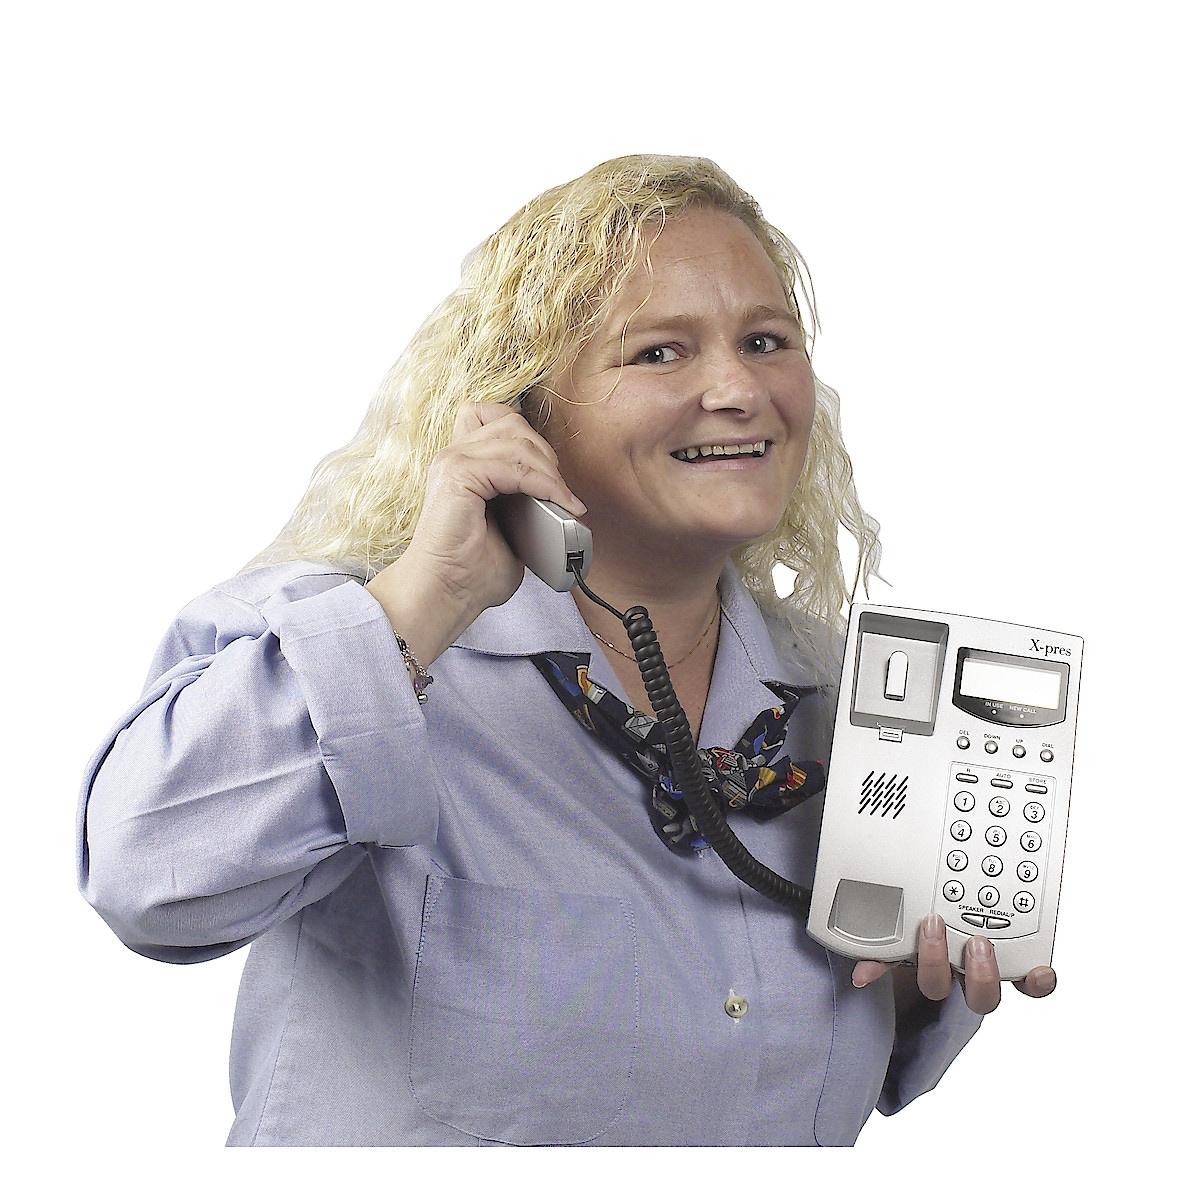 Telefon, Comsys XL1000